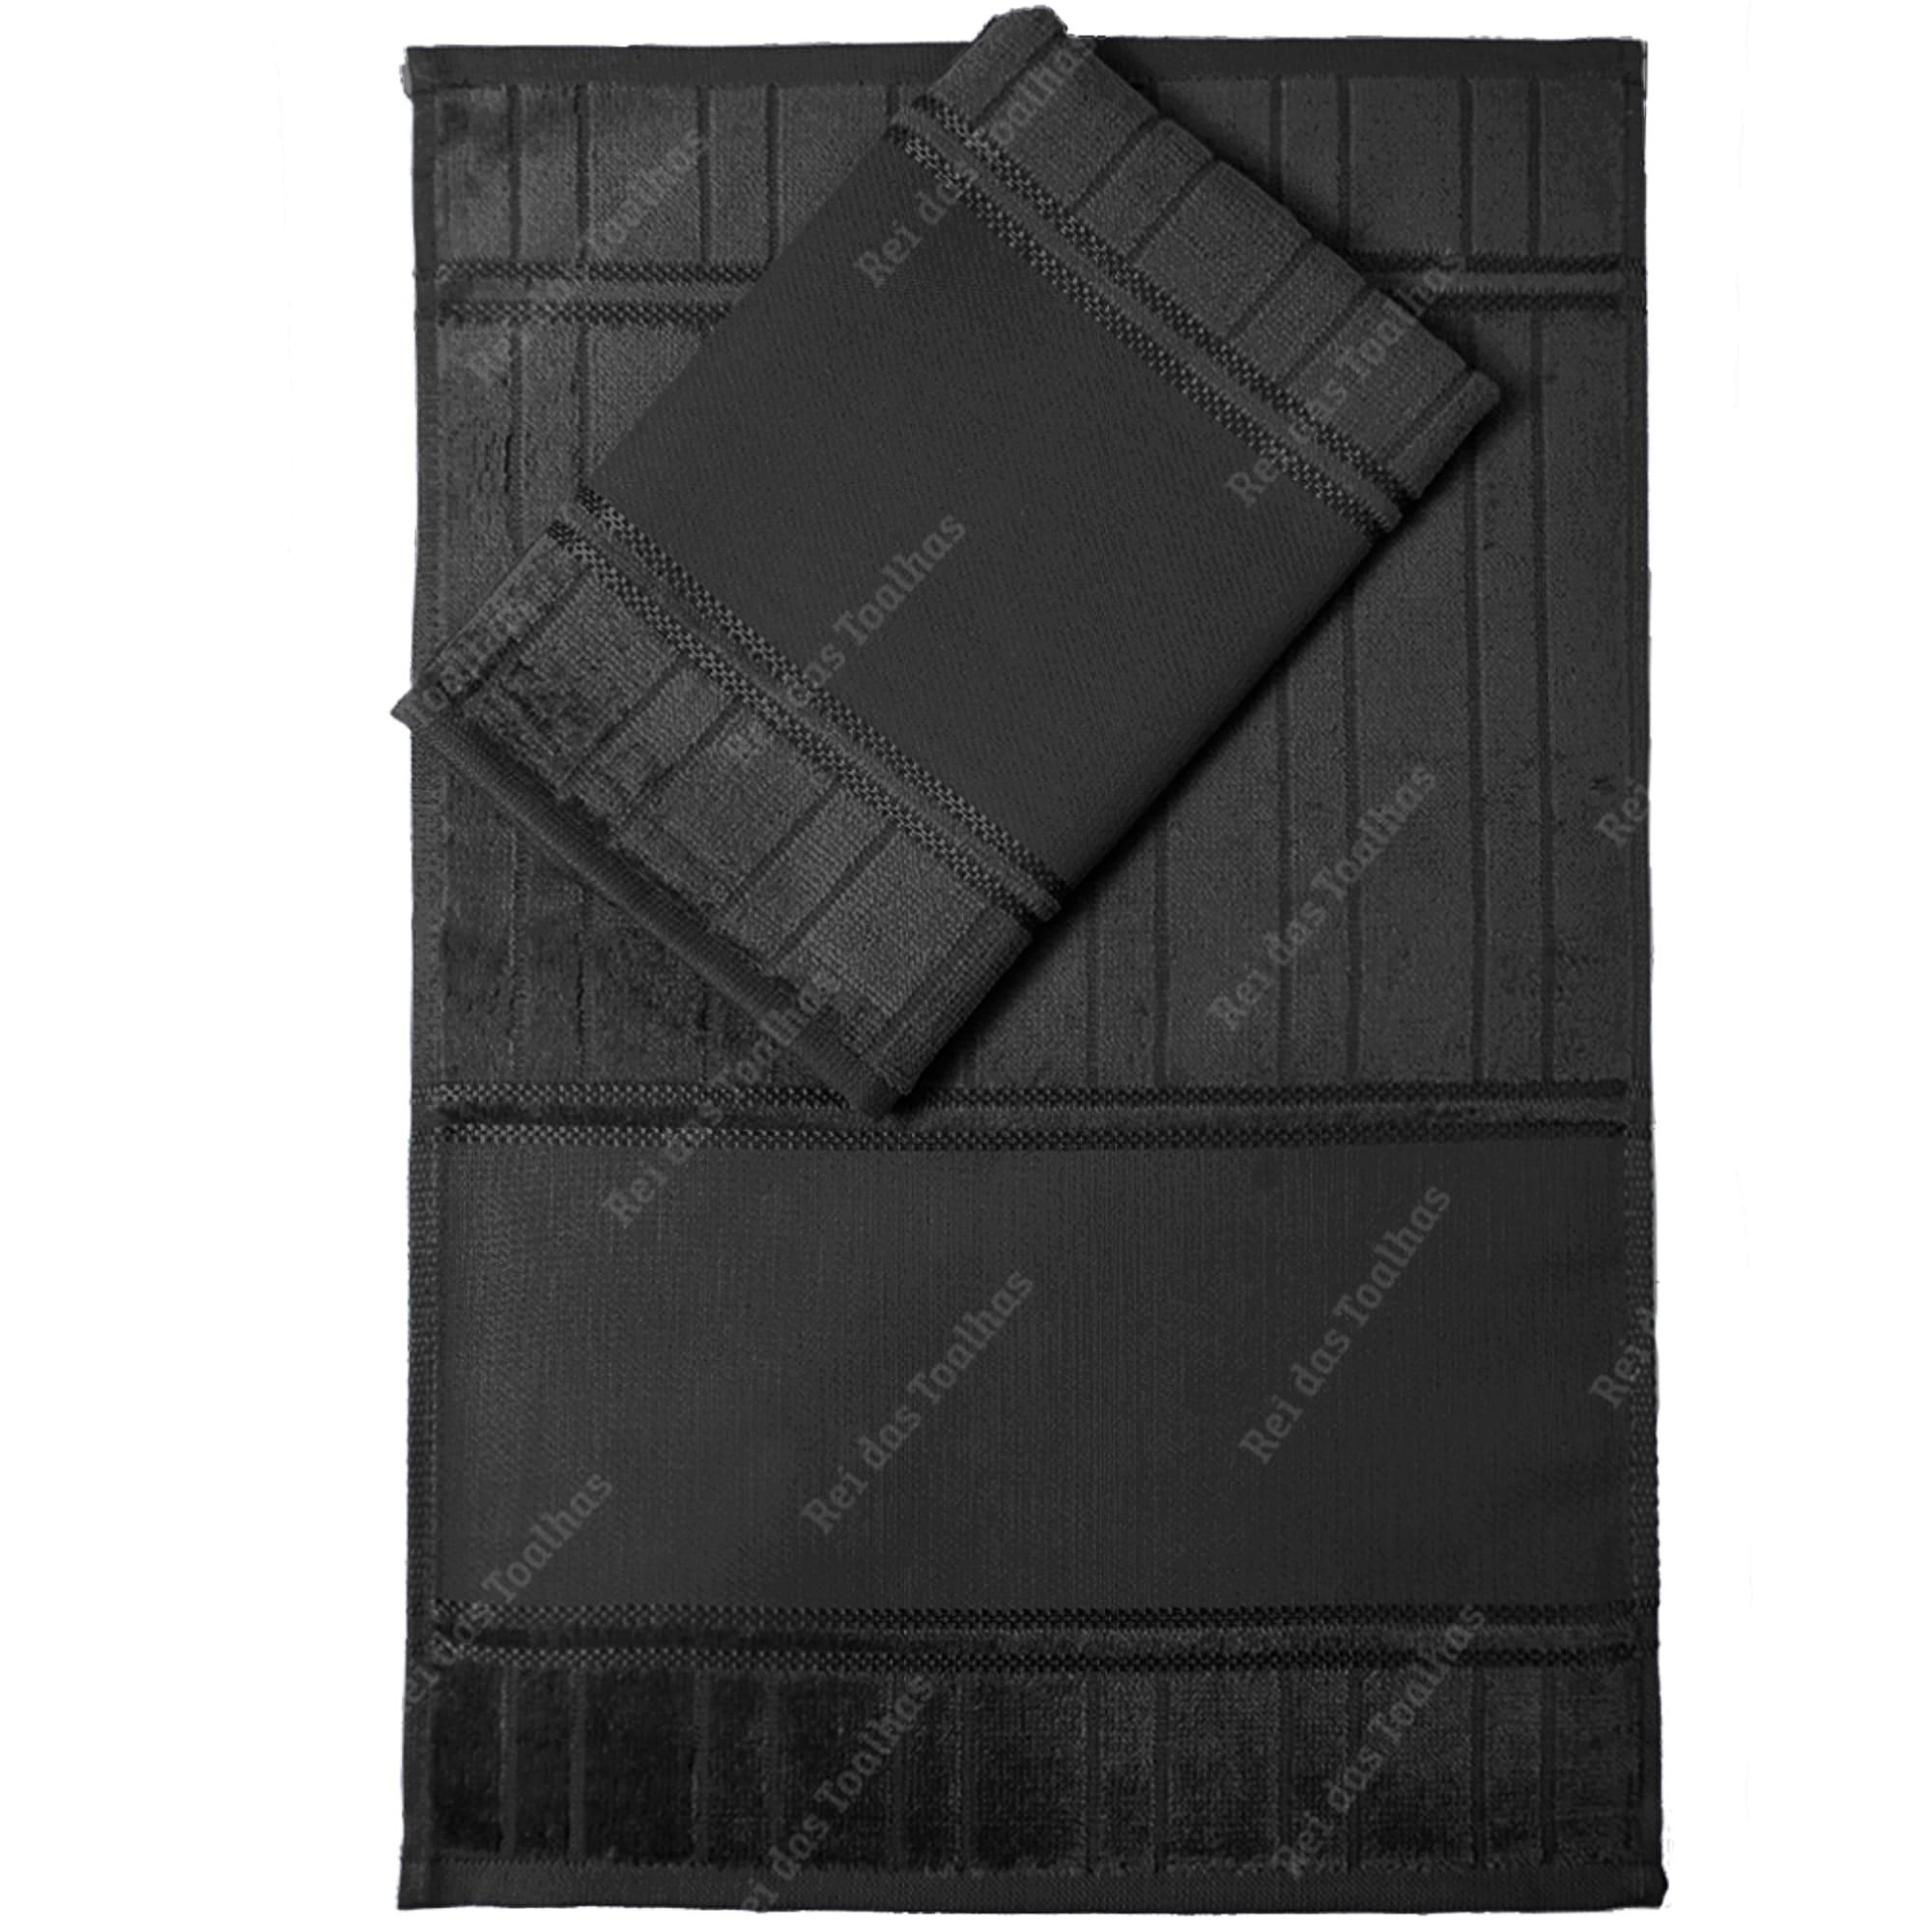 Kit Com 12 Lavabos Para Pintar Velour Artesanalle PRETO 30X45cm DOHLER